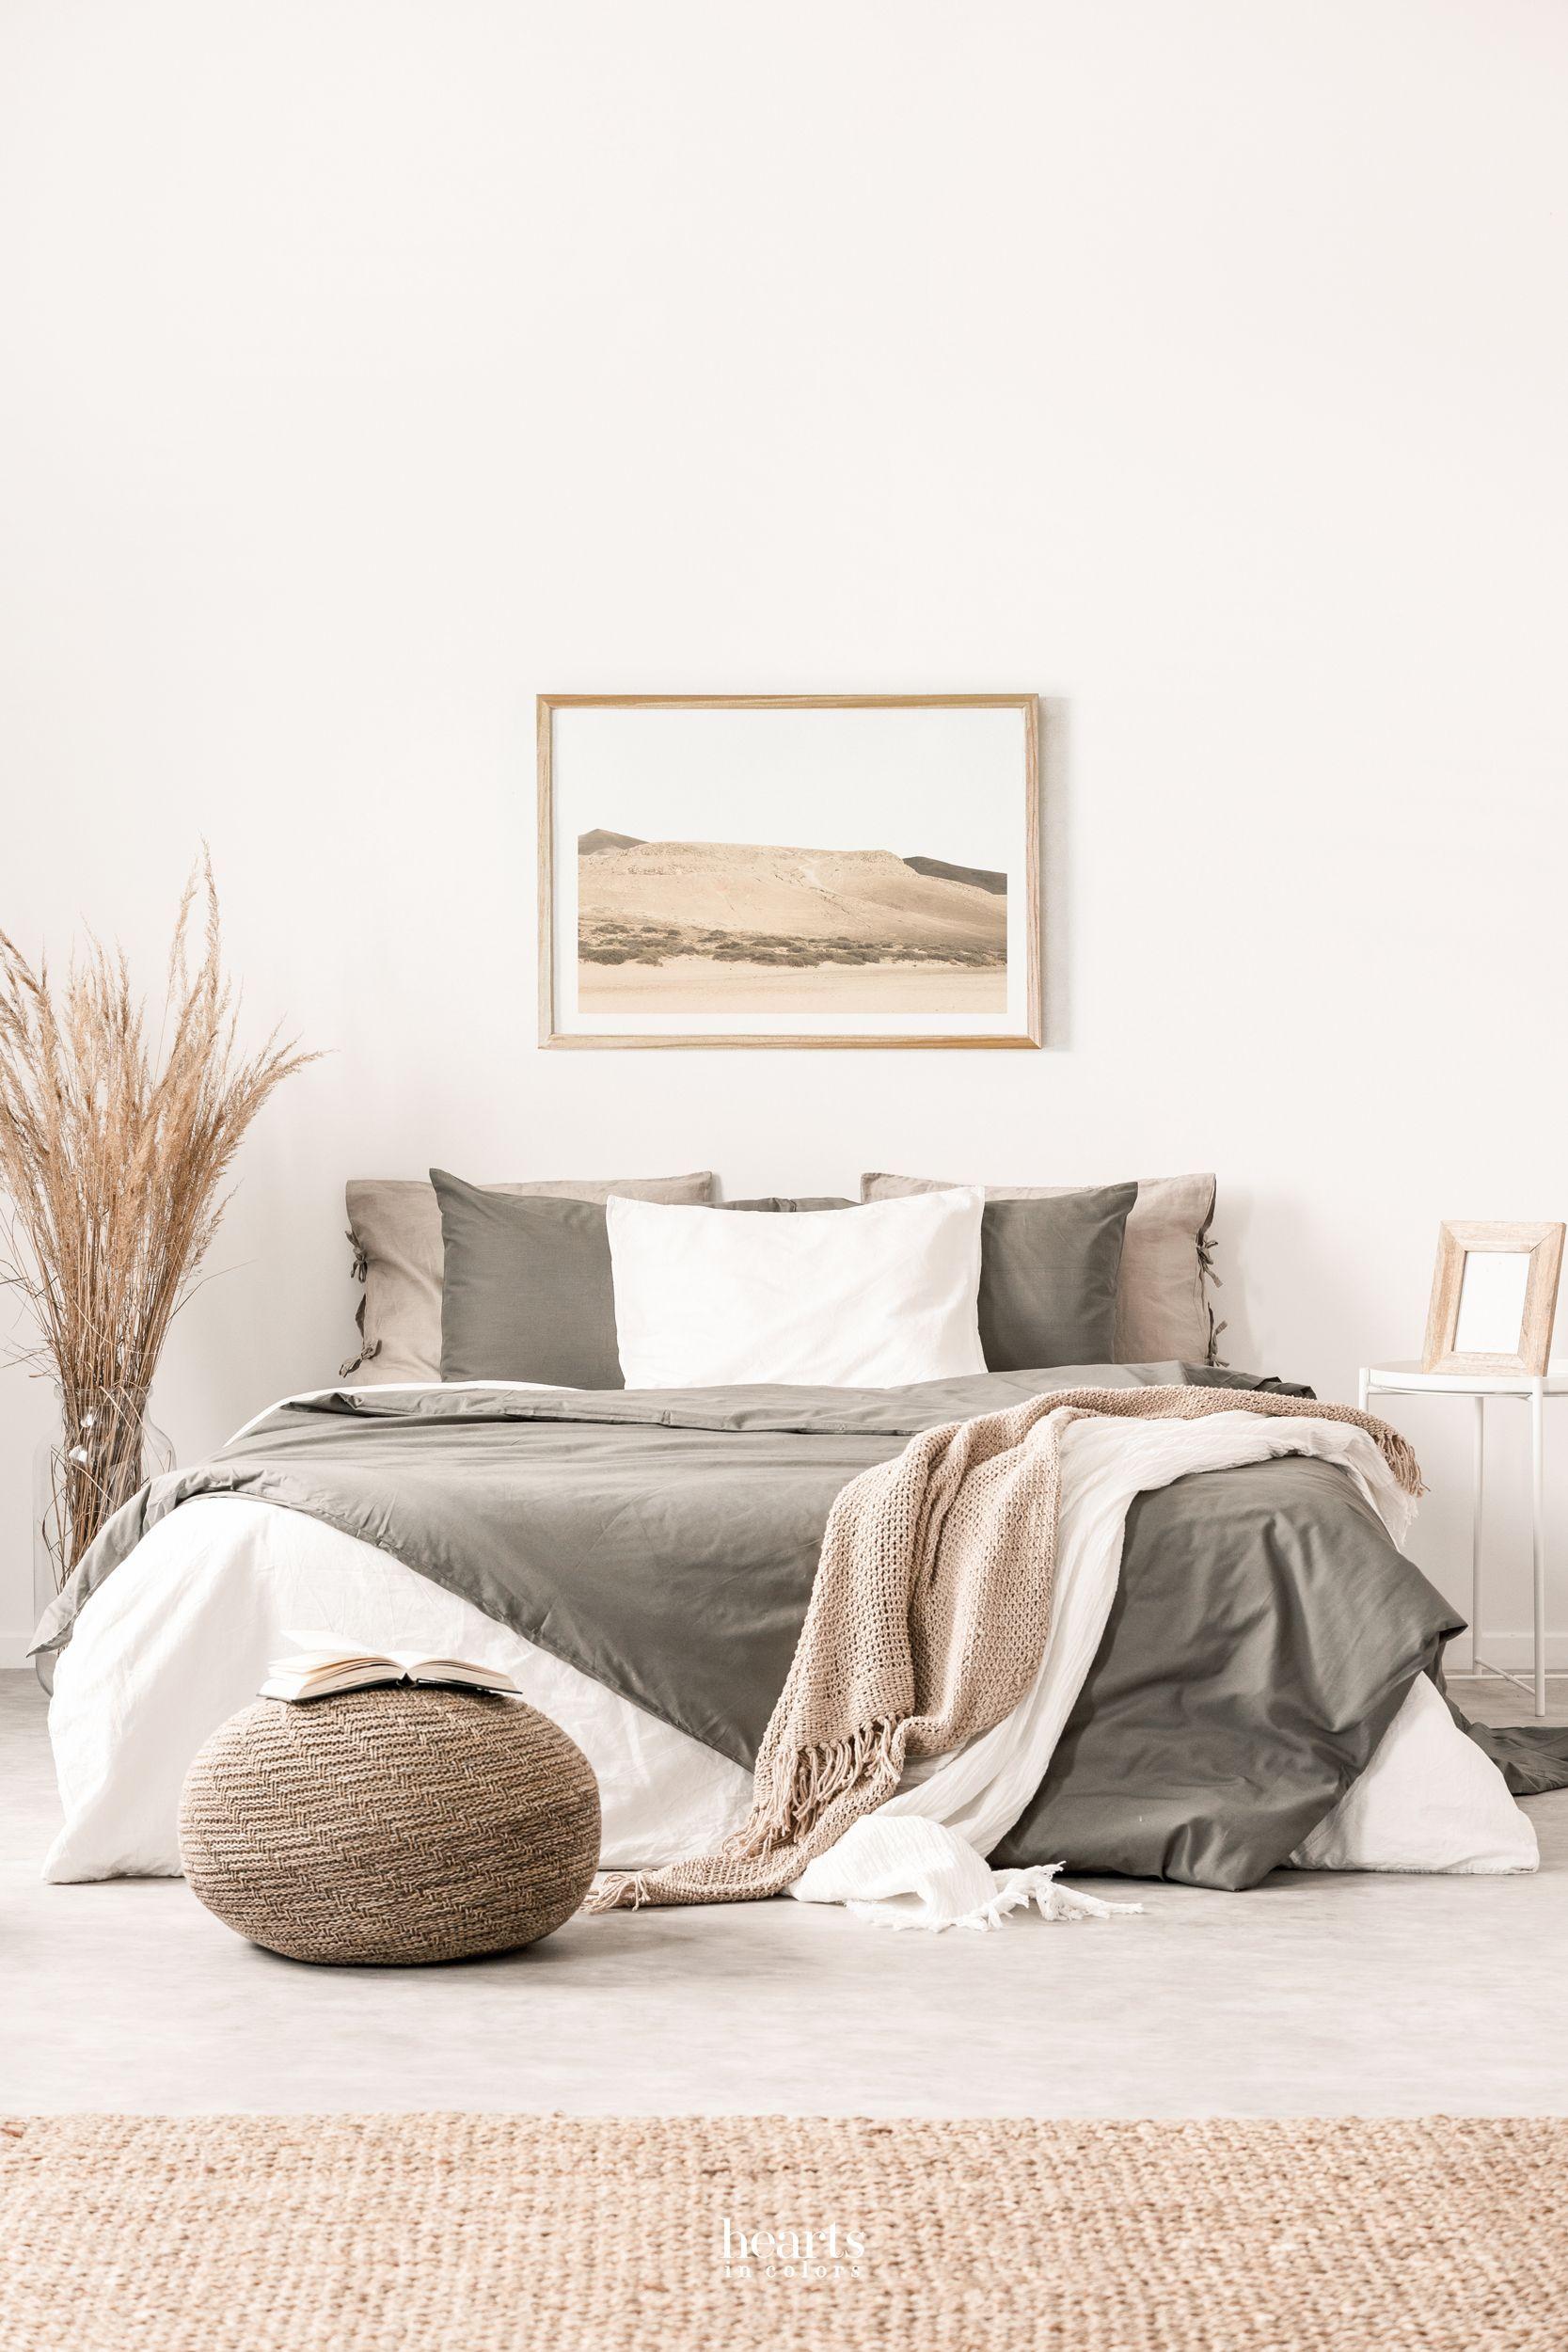 Desert Print, DIY PRINT, Horizontal Print, Wall Print, Wall Decor, Wall Art, Desert Wall Art, Landscape Print, Large Wall Art, Art Prints | landscaping